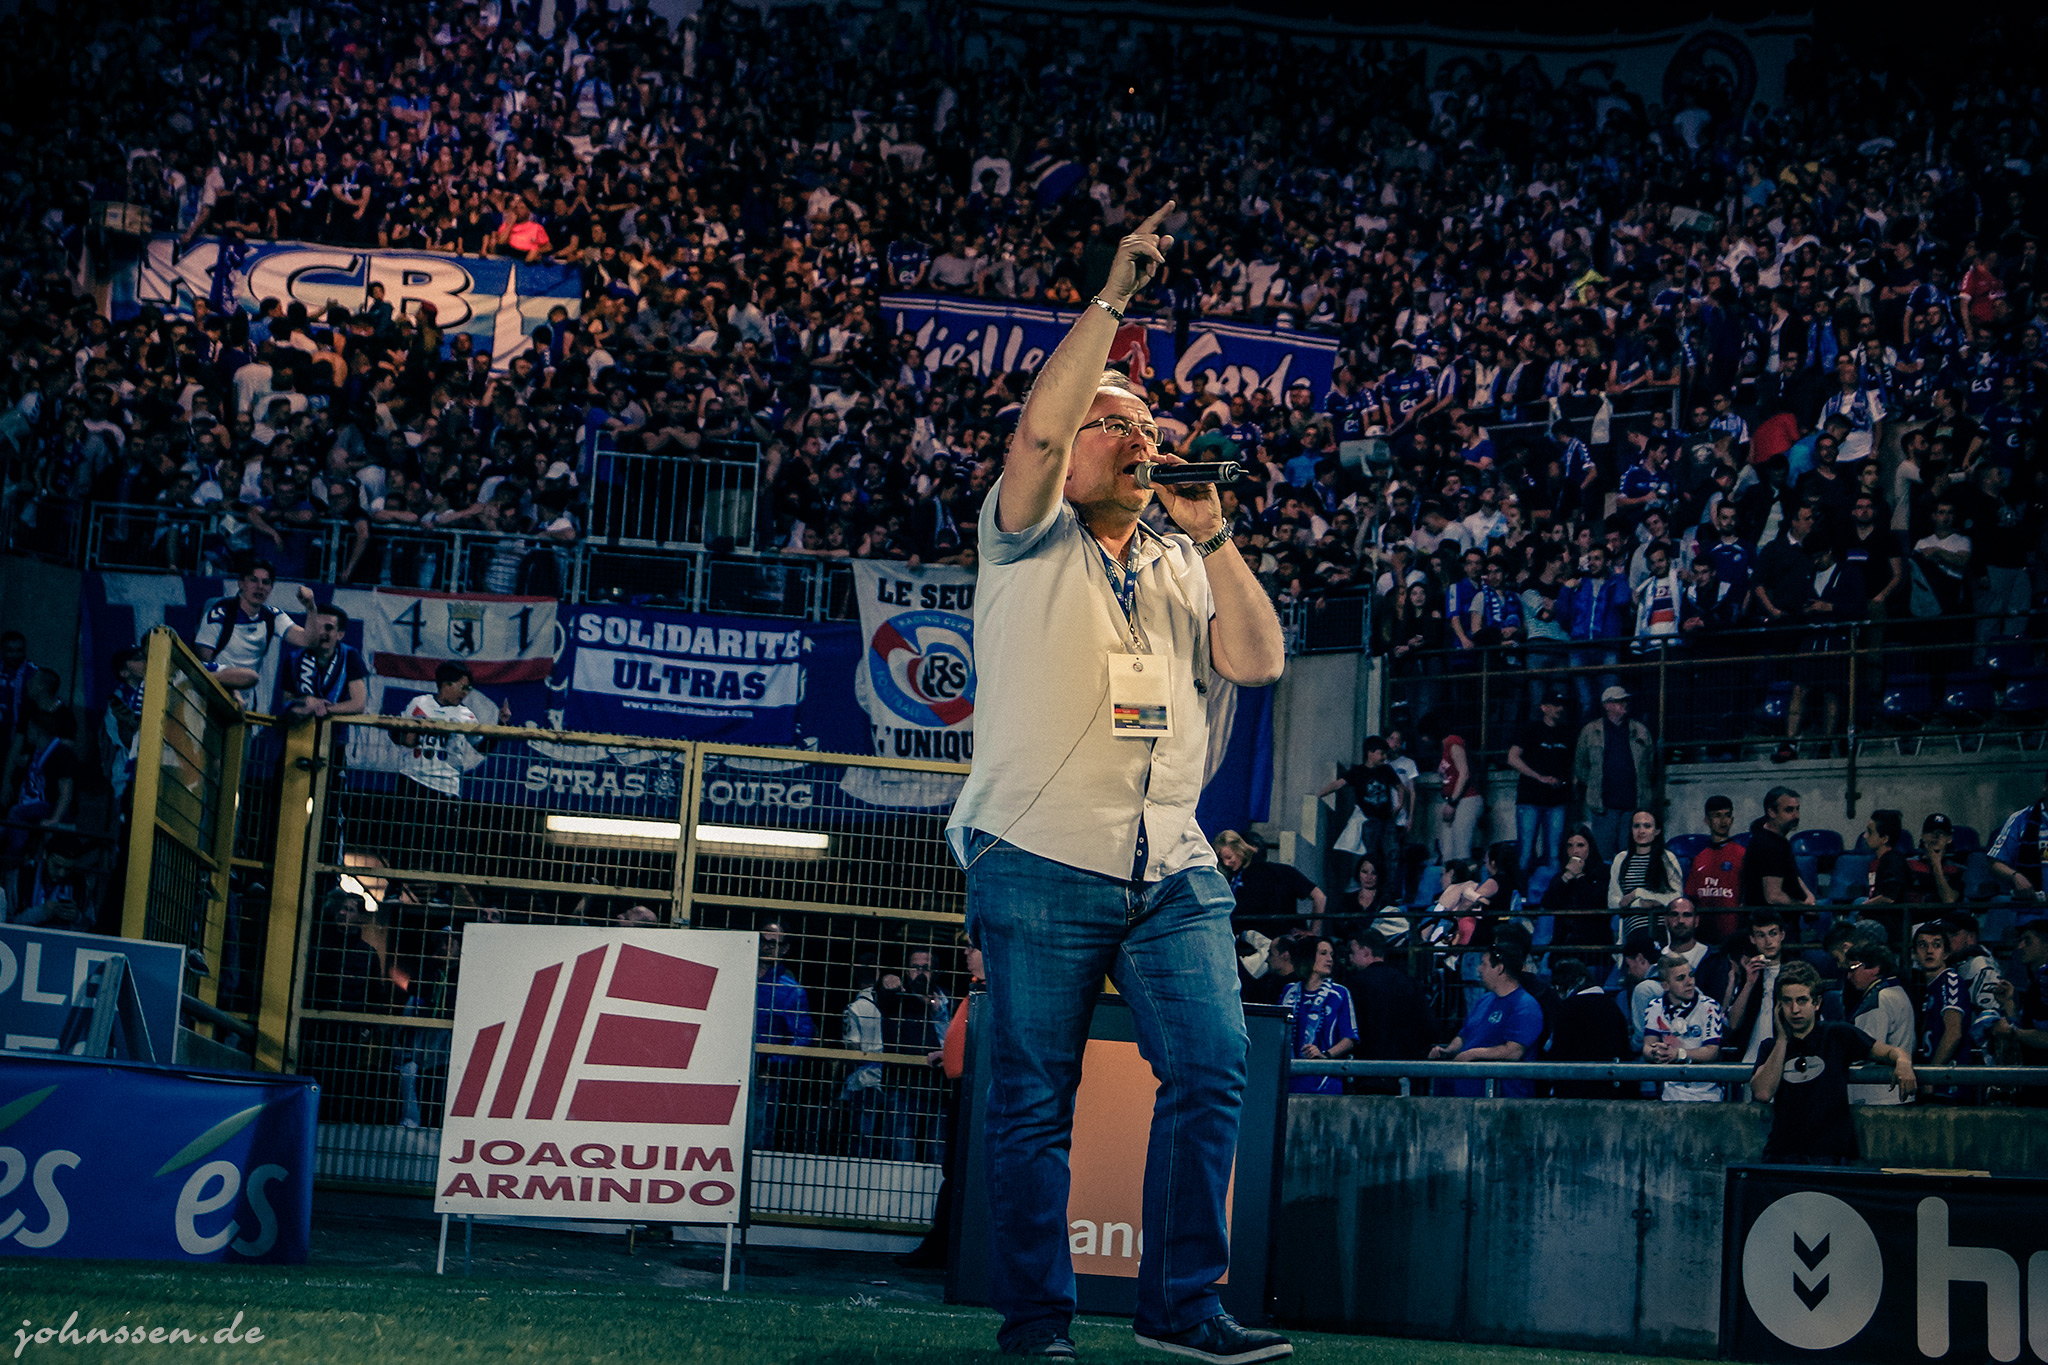 Jean-Luc Filser, le speakeur du stade de la Meinau